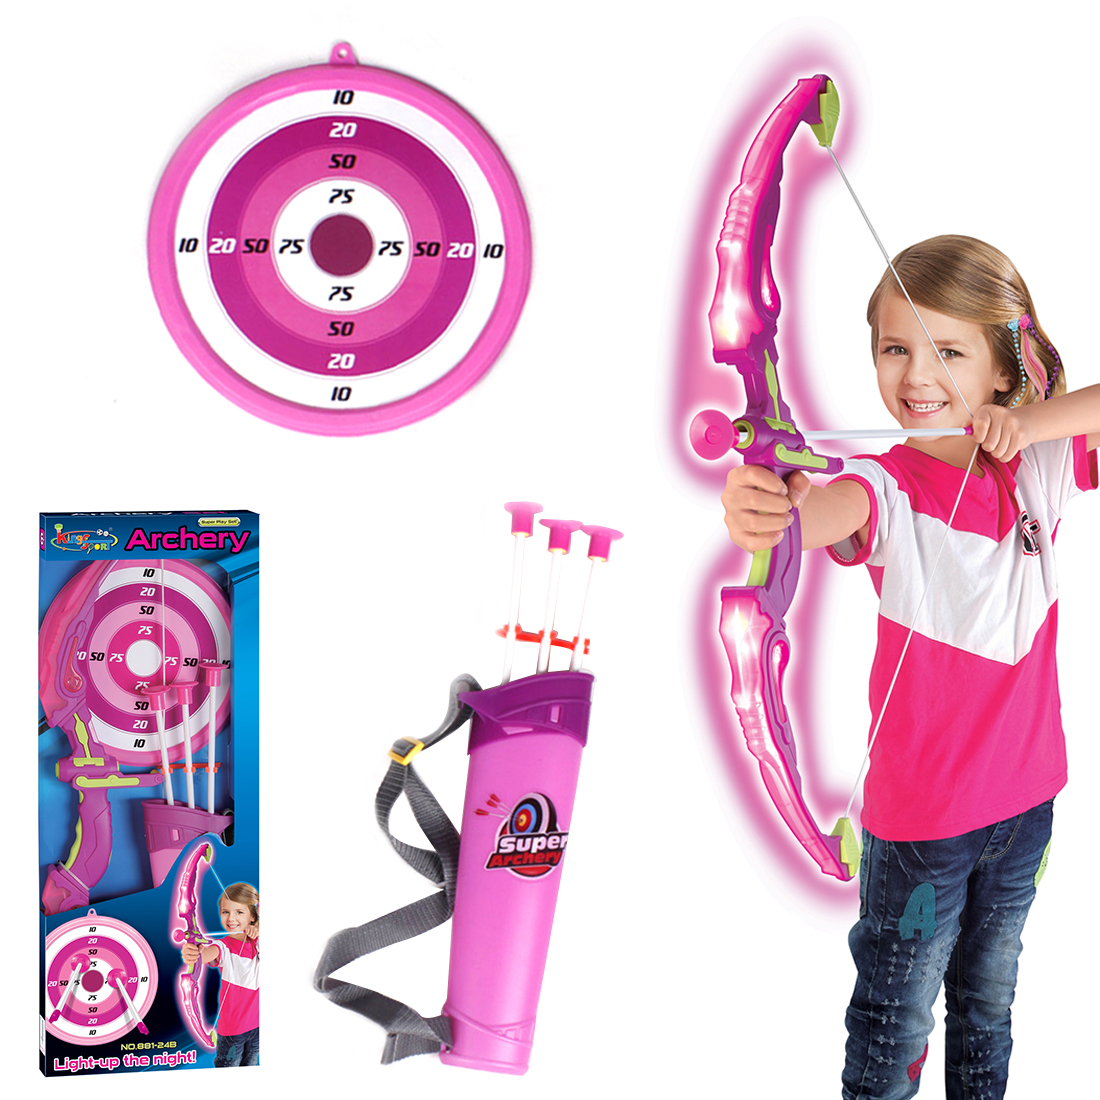 Mainan Anak Panahan Busur Dan Panah Target Kertas Papan Plastik Olahraga Menembak Set Dengan Lampu Led